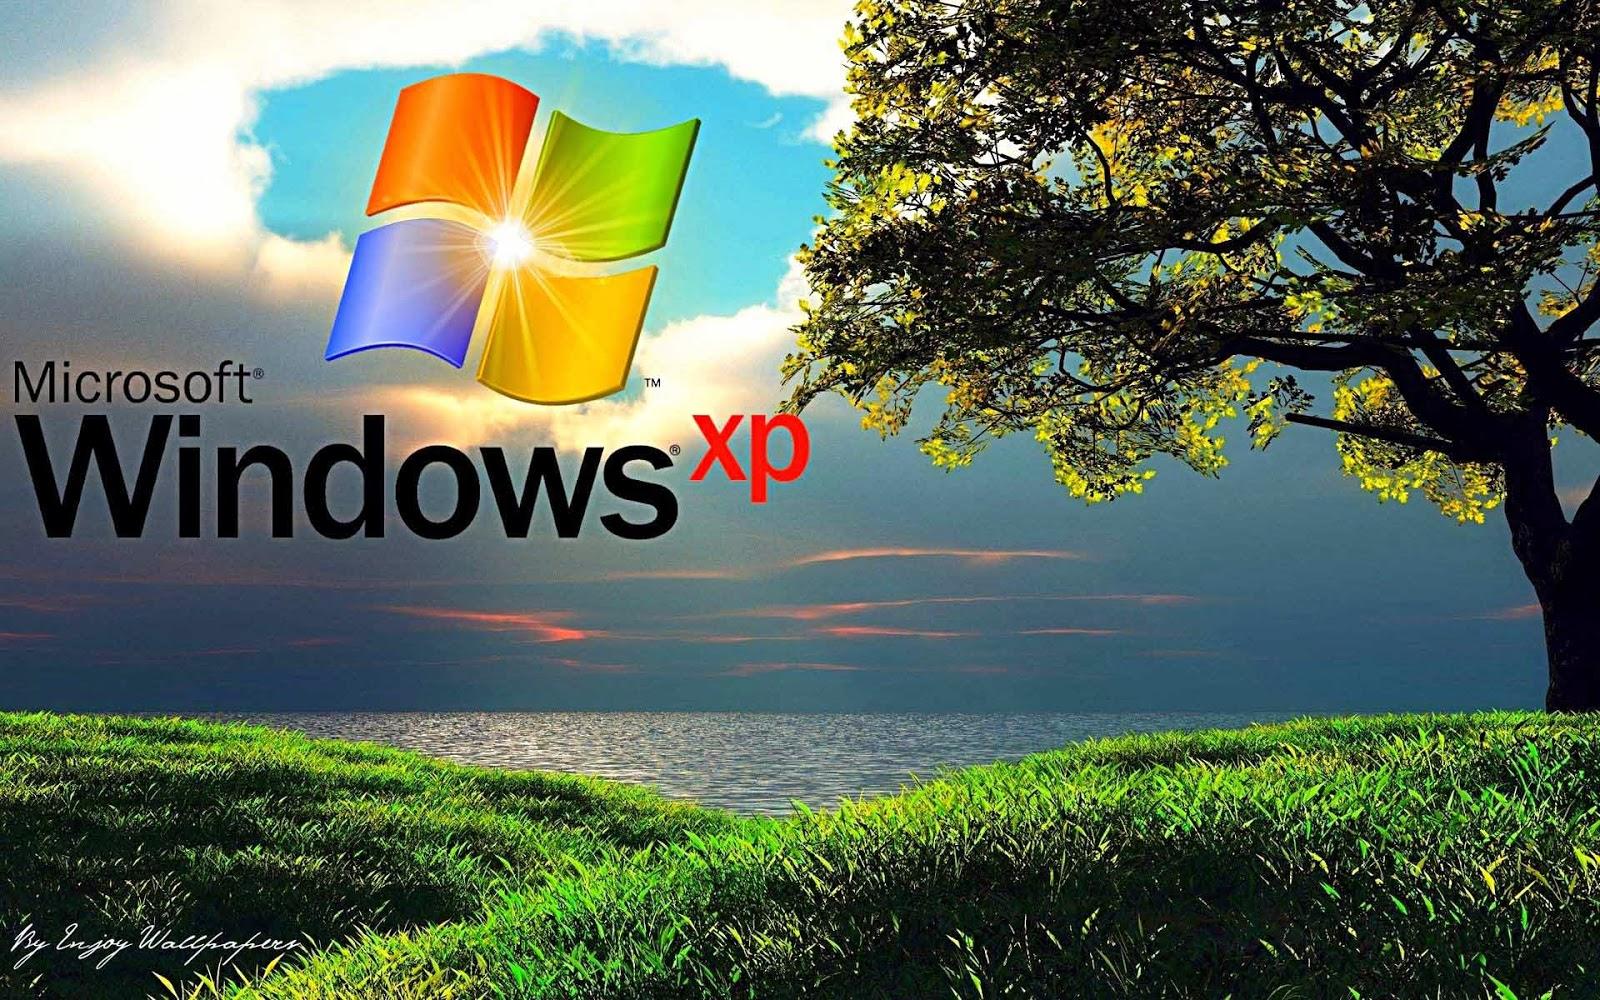 Hd Wallpapers 1080p Windows Xp Nice Pics Gallery